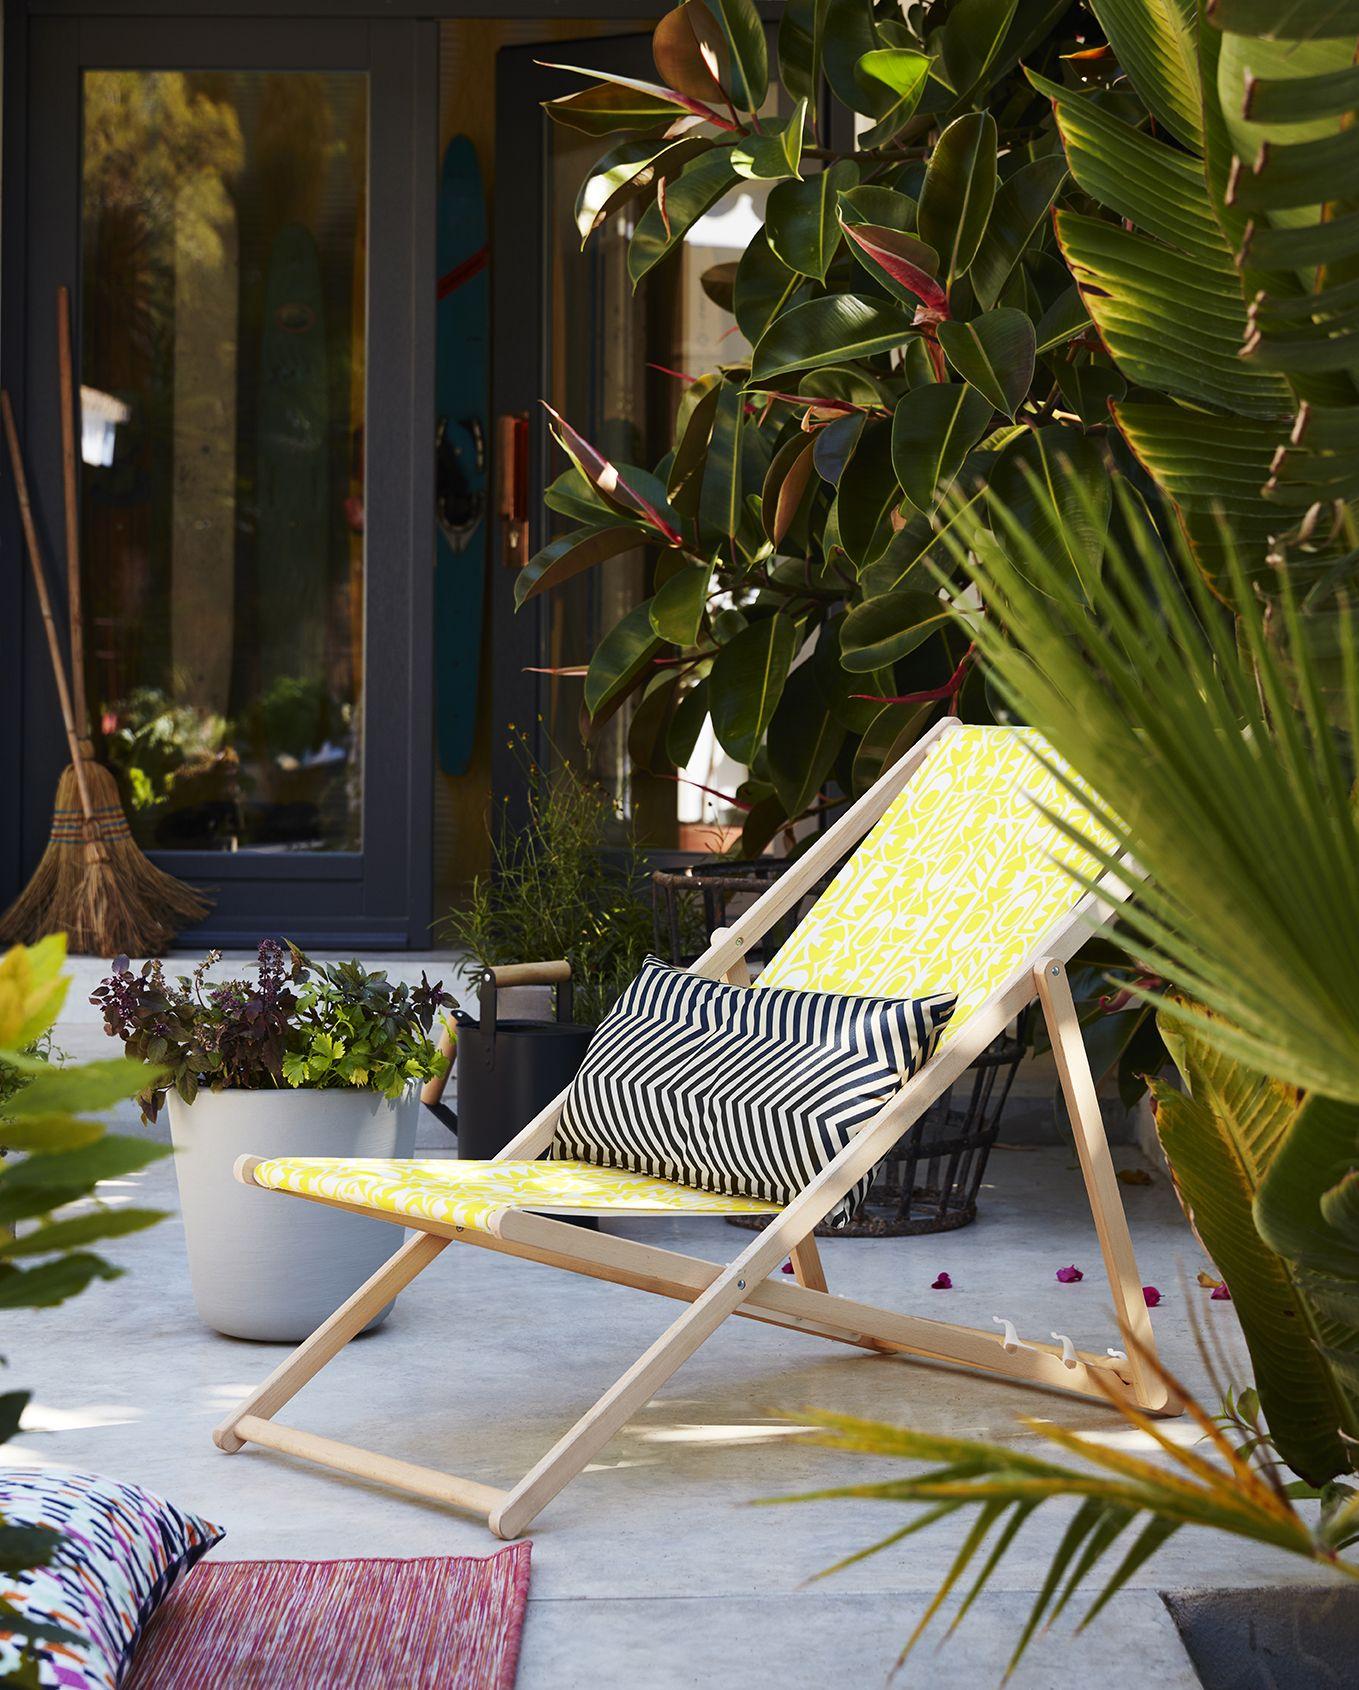 Ikea Sommer 2017 Kollektion Strandstuhl Draussenzimmer